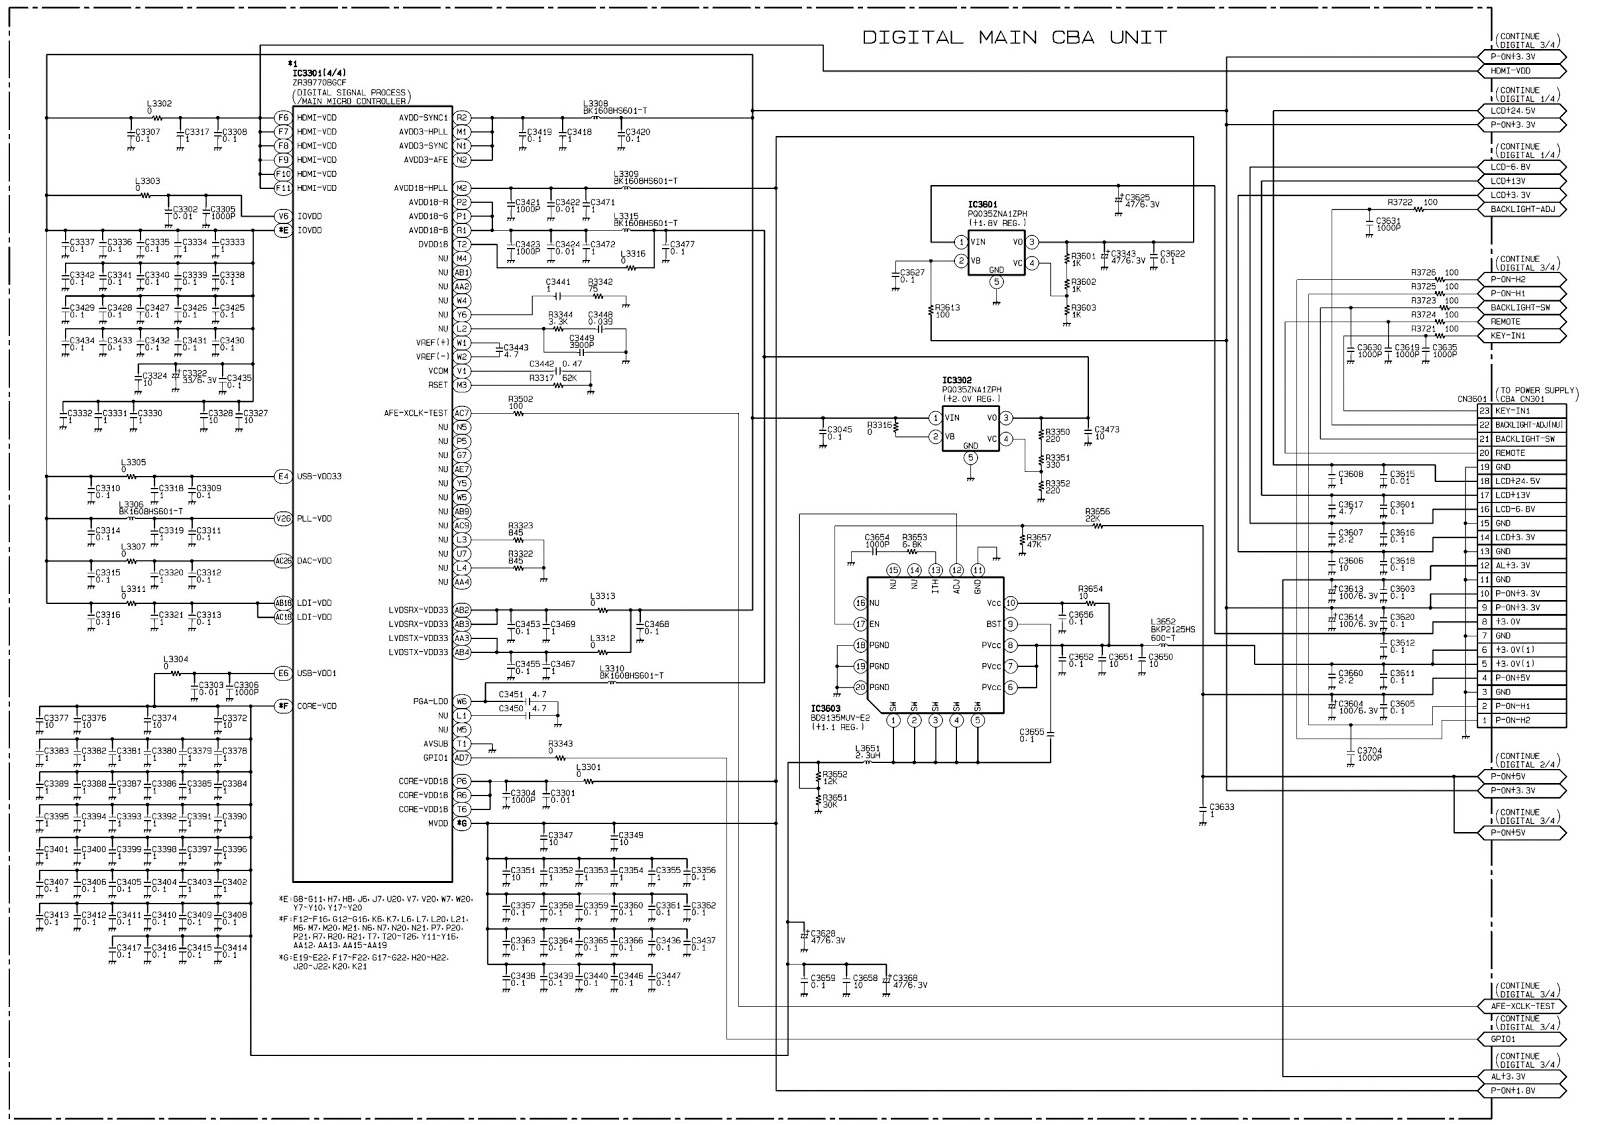 crutchfield speaker wiring diagram imageresizertool com parallel speaker wiring diagram wiring diagram for speaker connection [ 1600 x 1125 Pixel ]